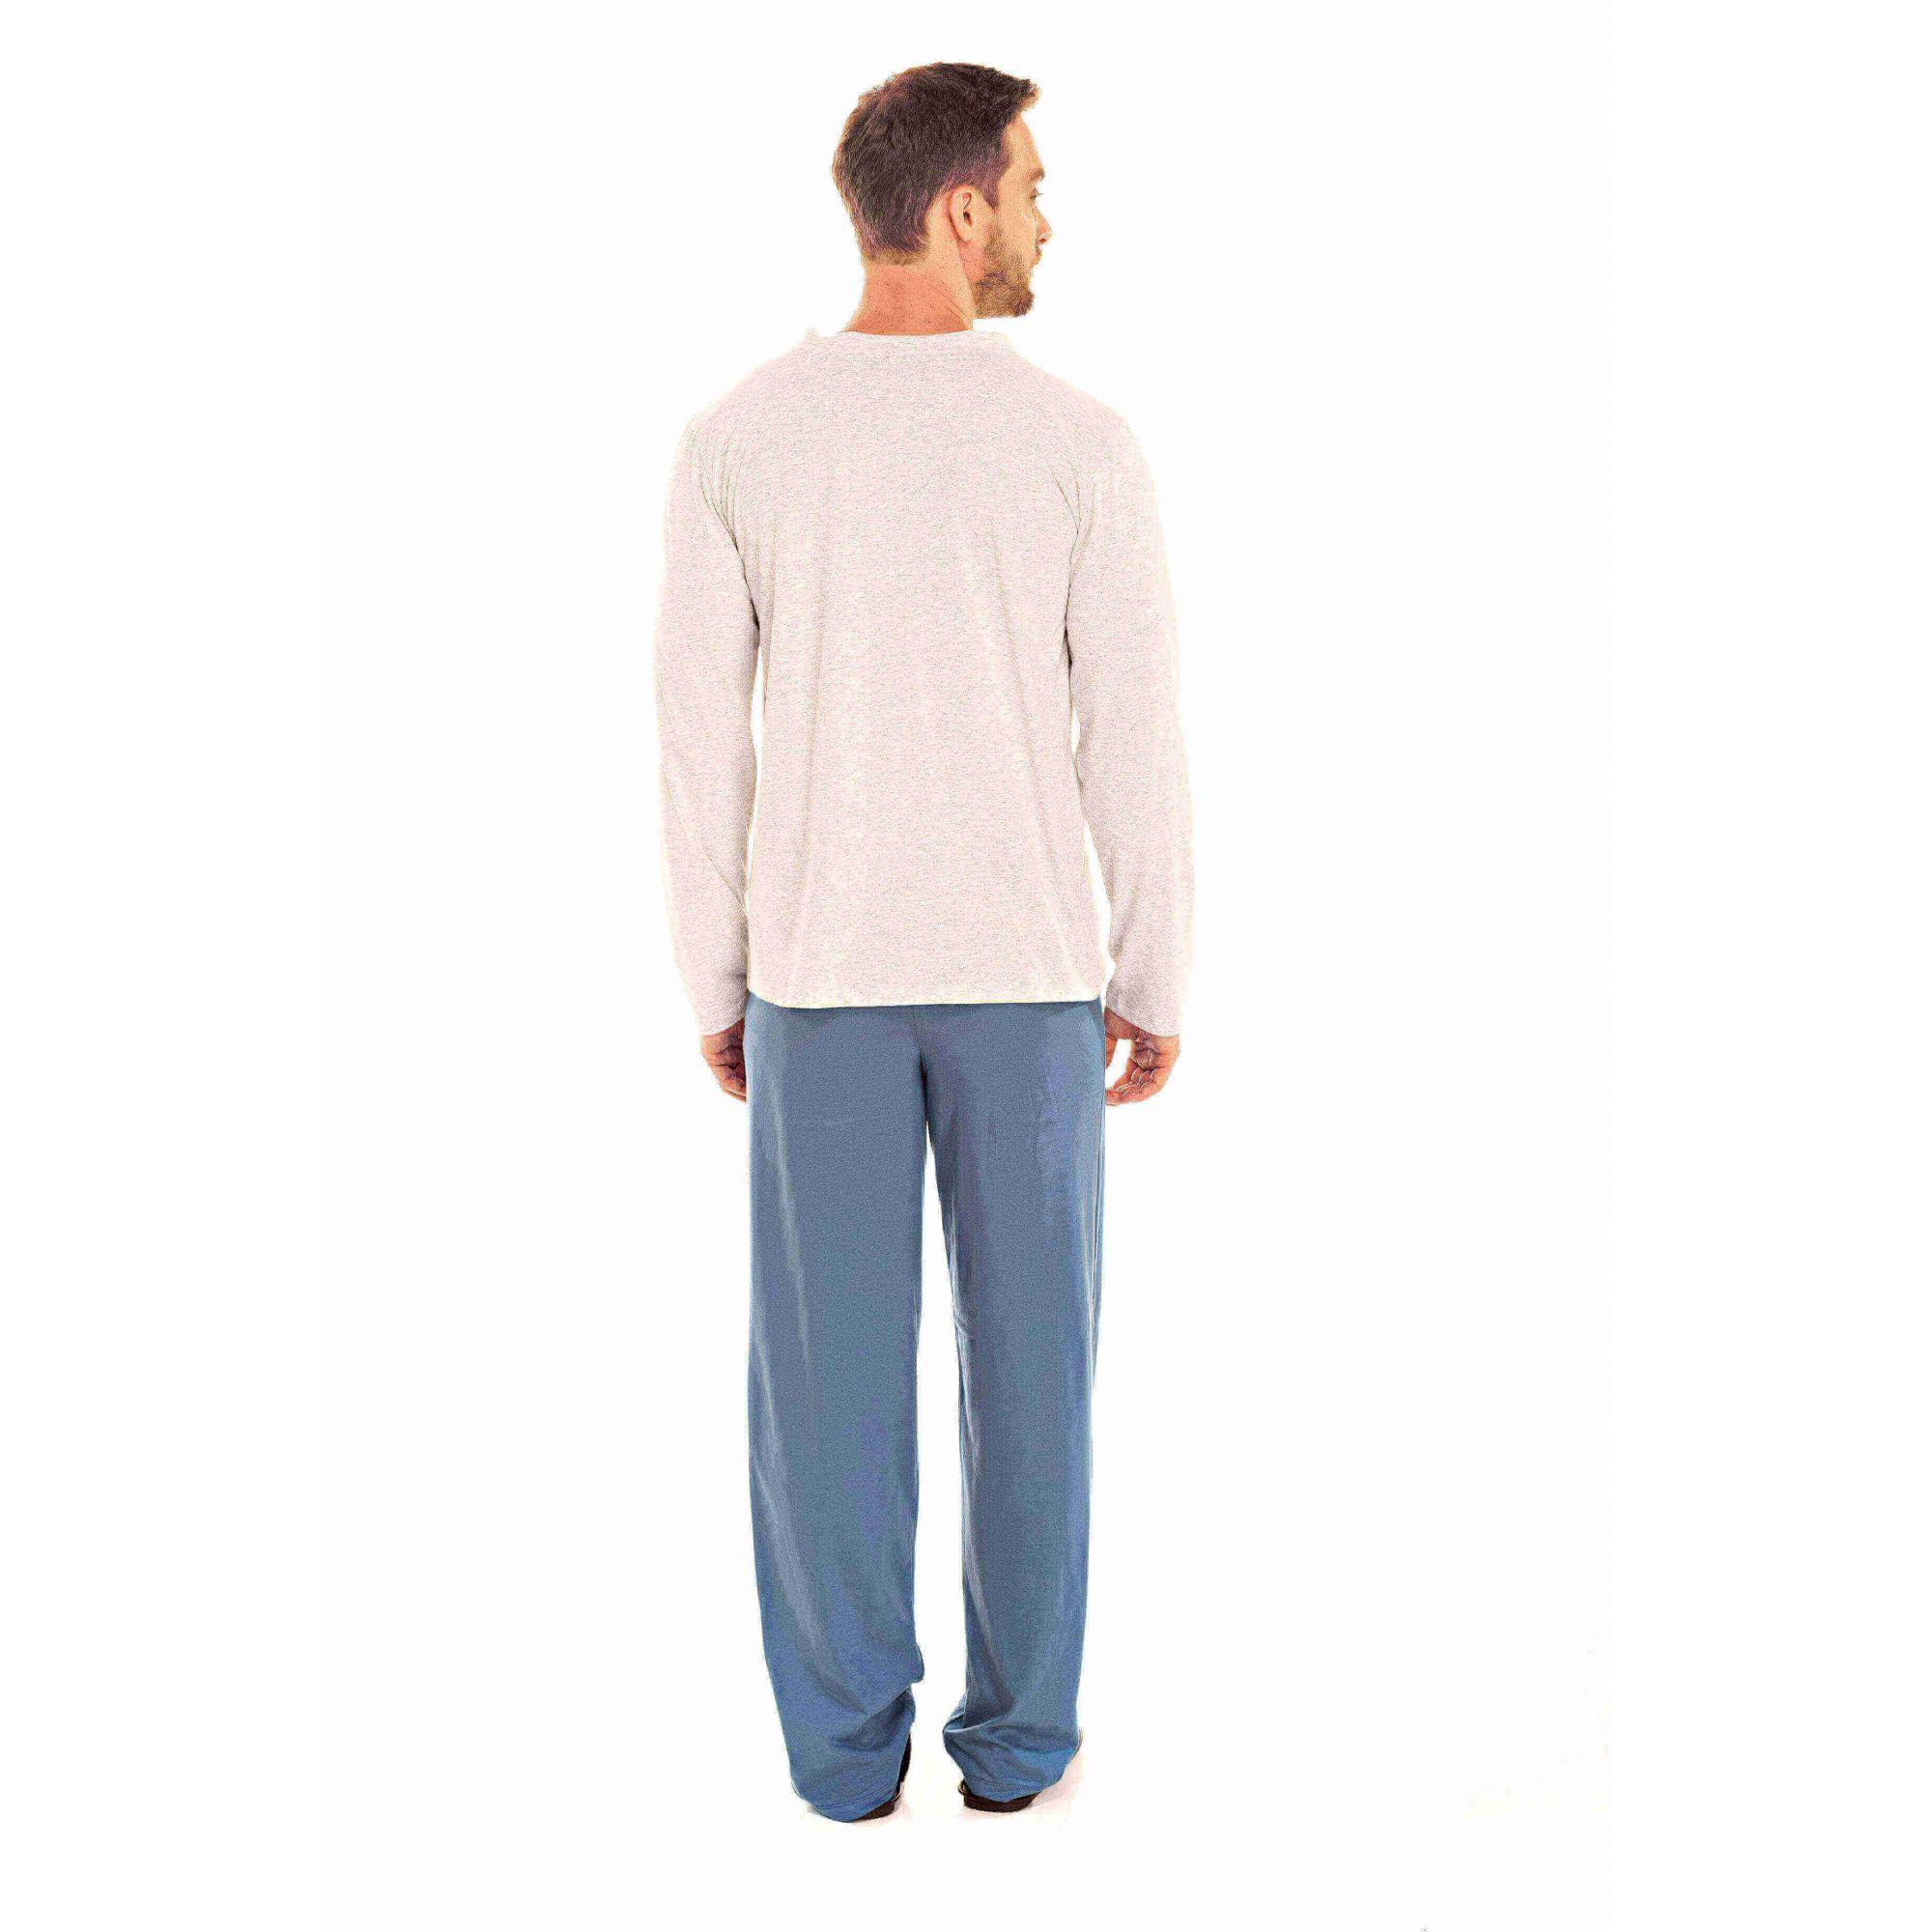 087/C - Pijama Adulto Masculino Aberto